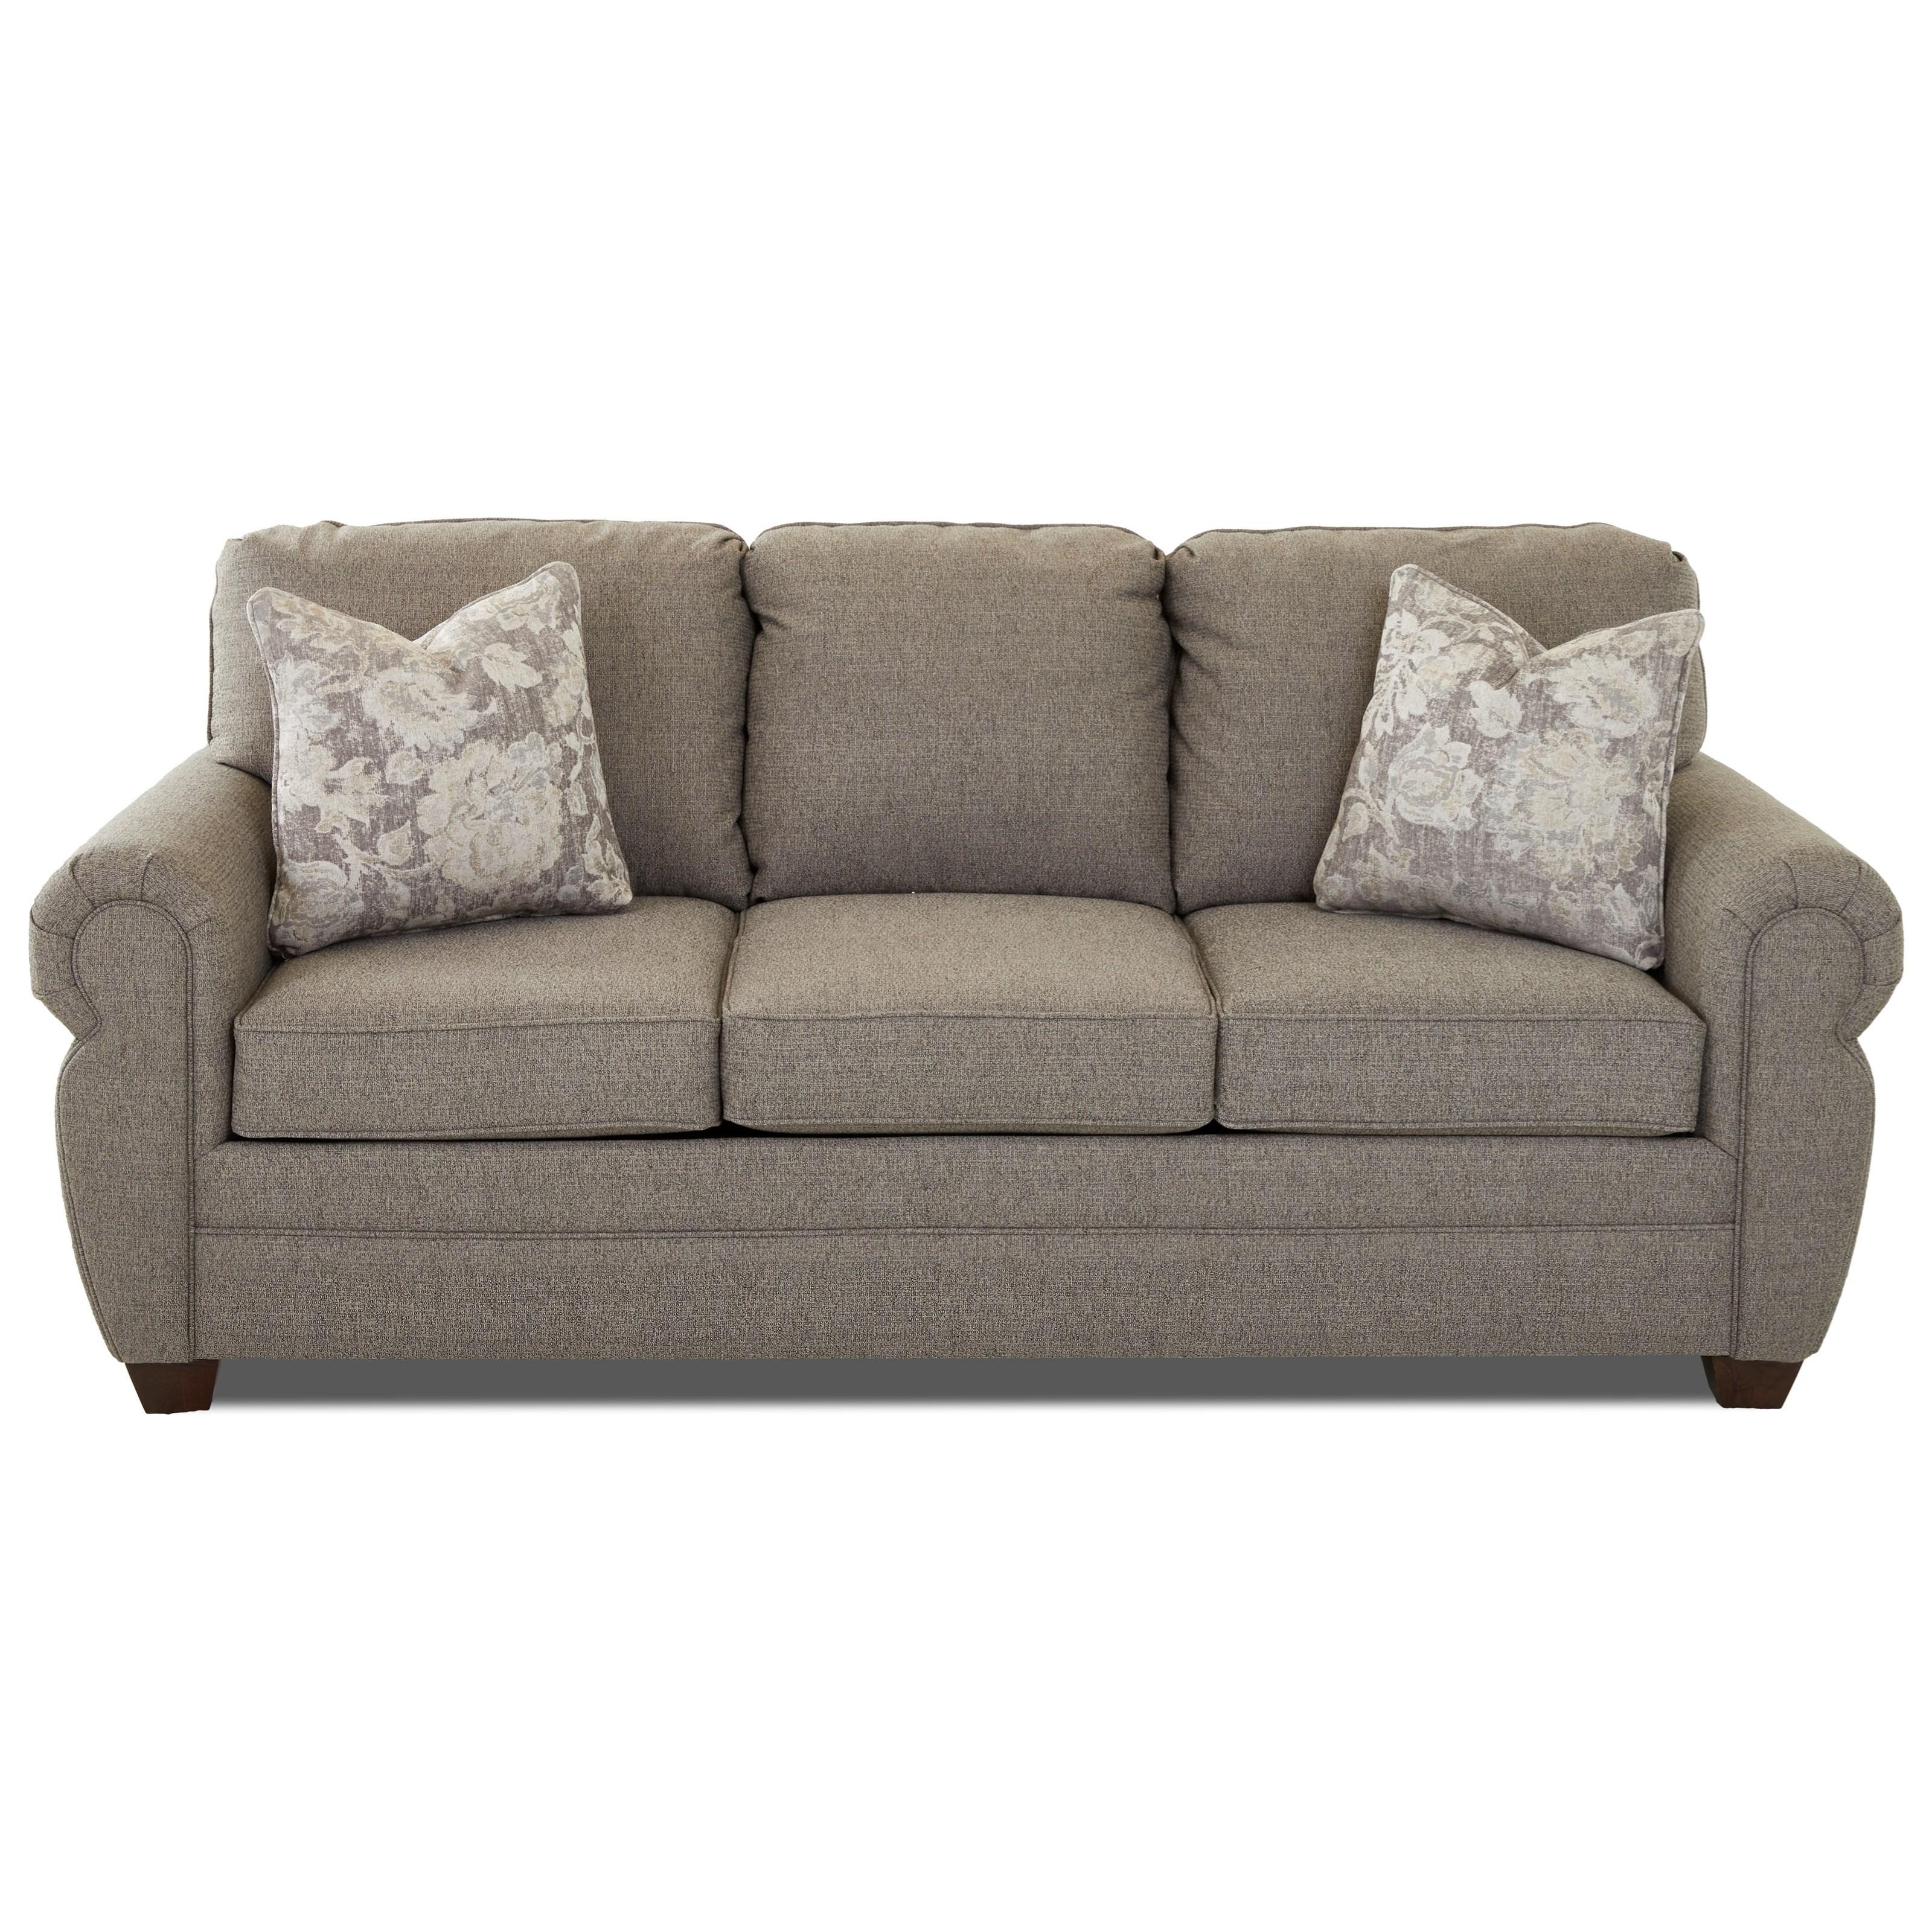 Westbrook Sleeper Sofa w/ Dreamquest Mattress by Klaussner at Johnny Janosik